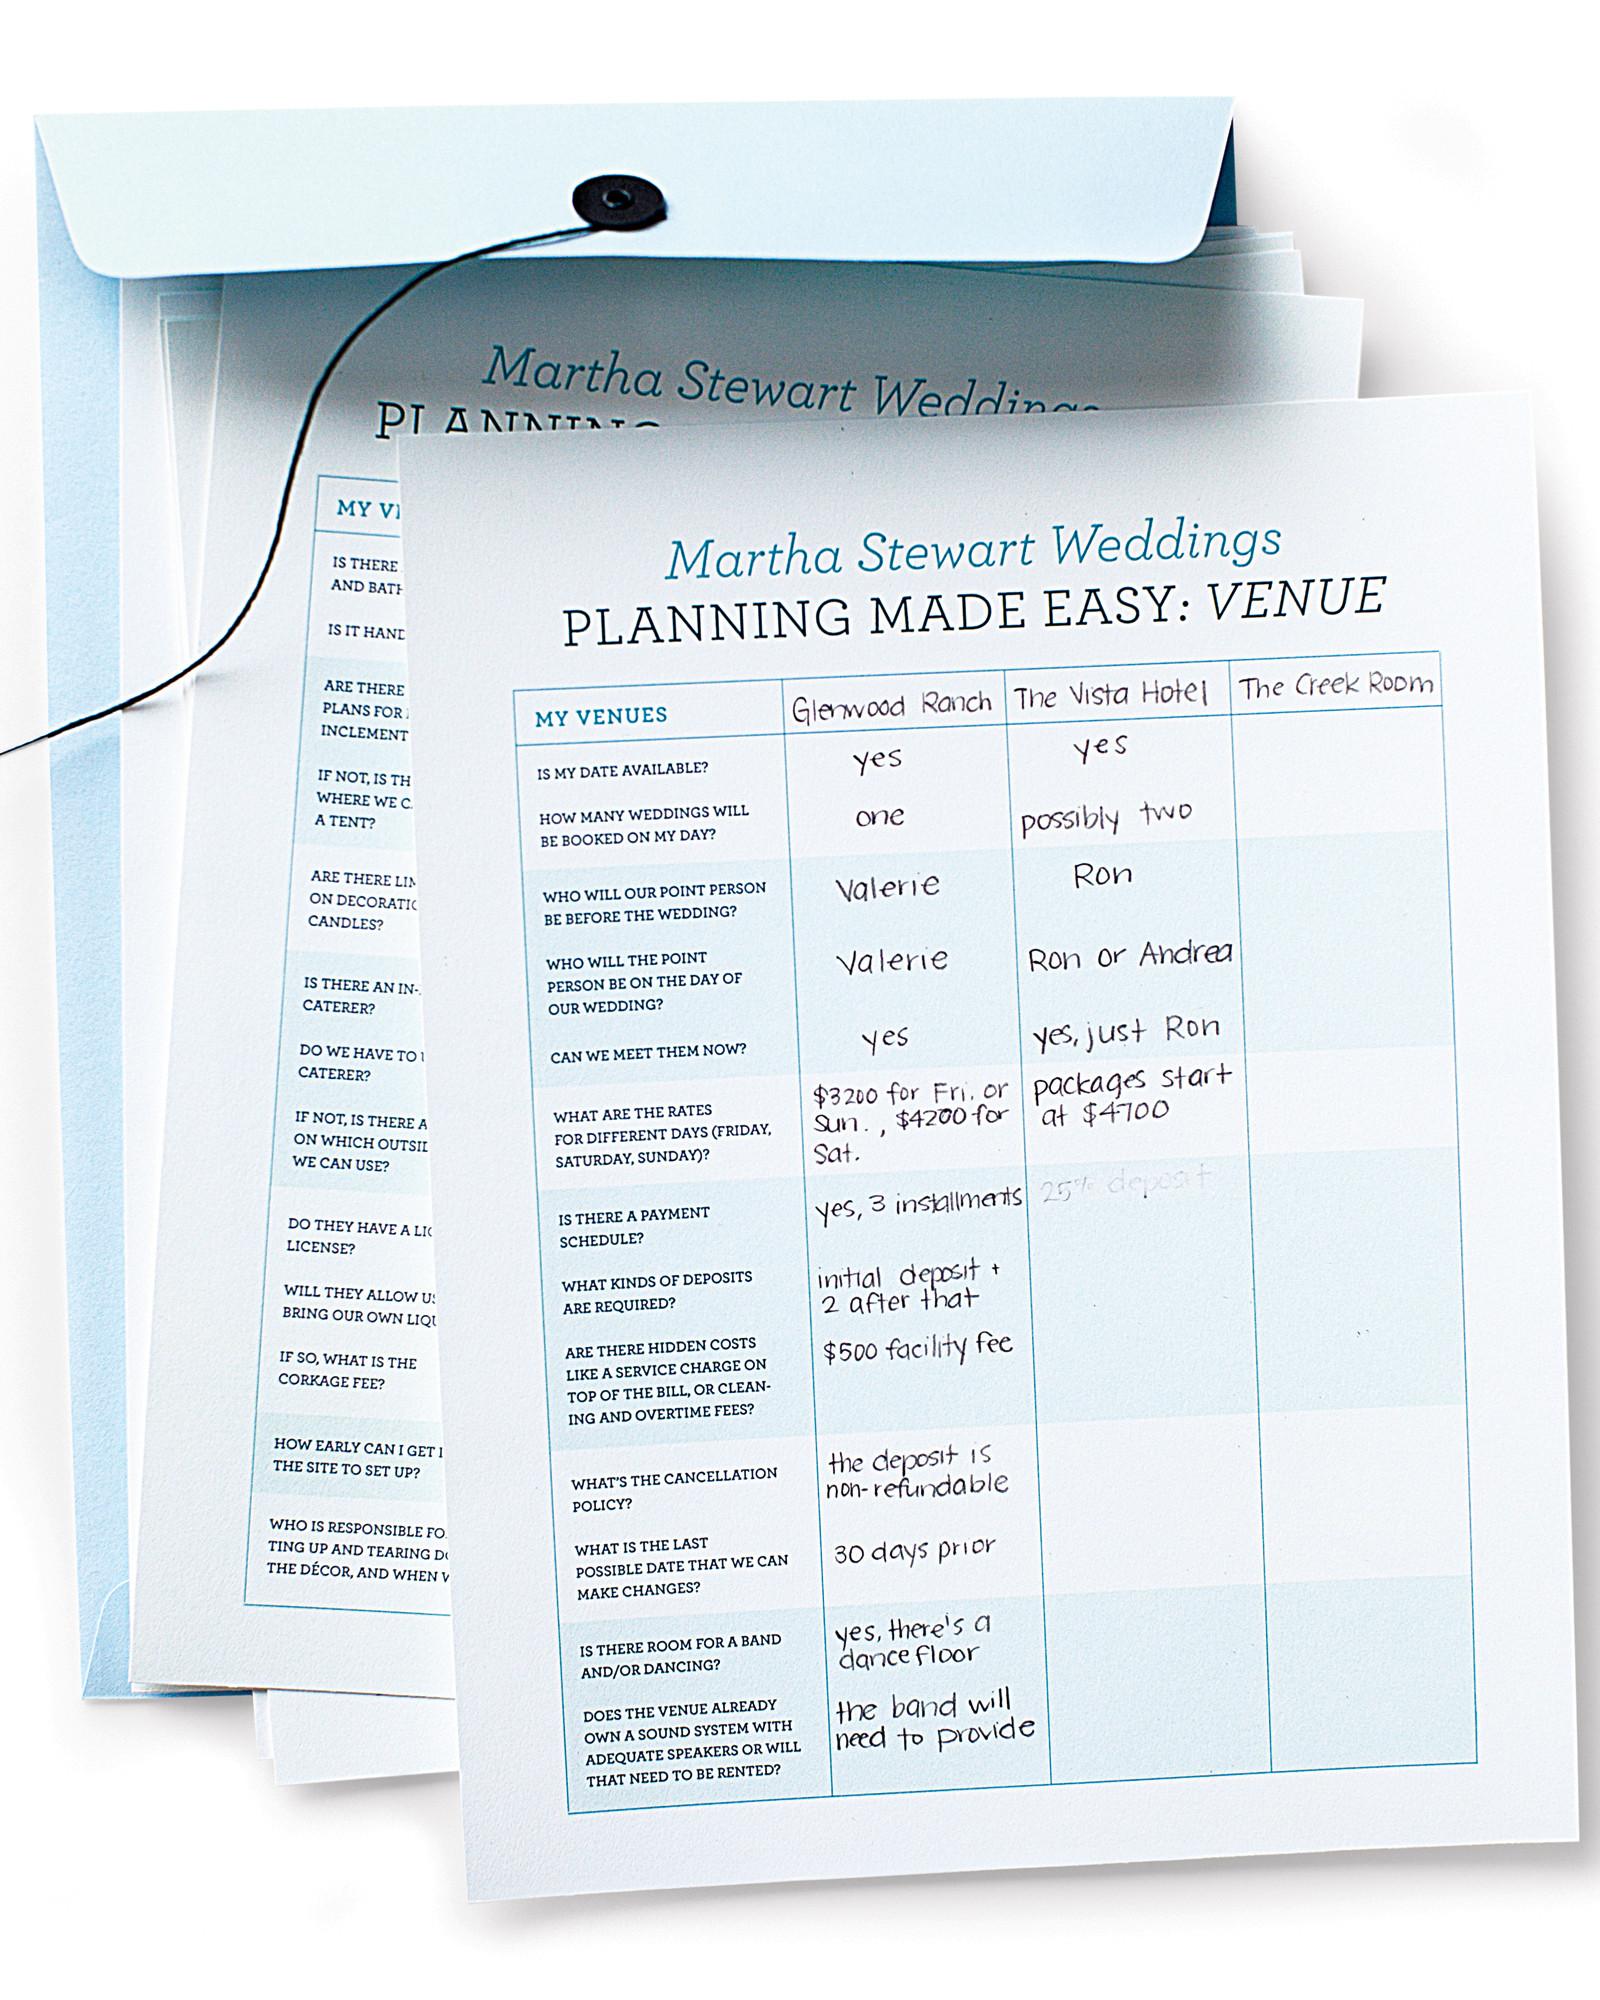 planning-guide-gt-mwd107748.jpg